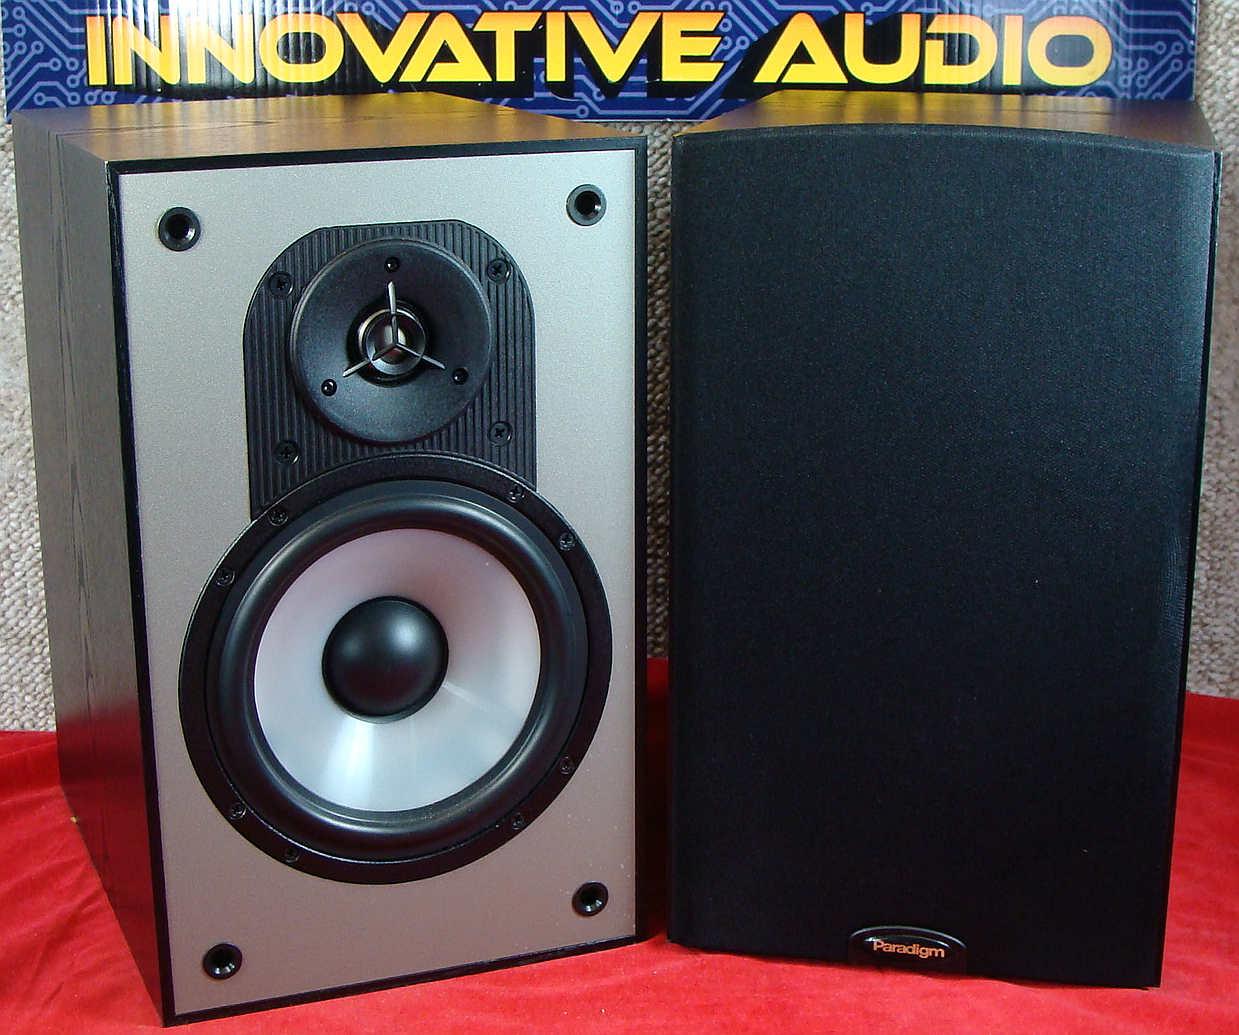 Innovative Audio Paradigm Mini Monitors V2 fronts